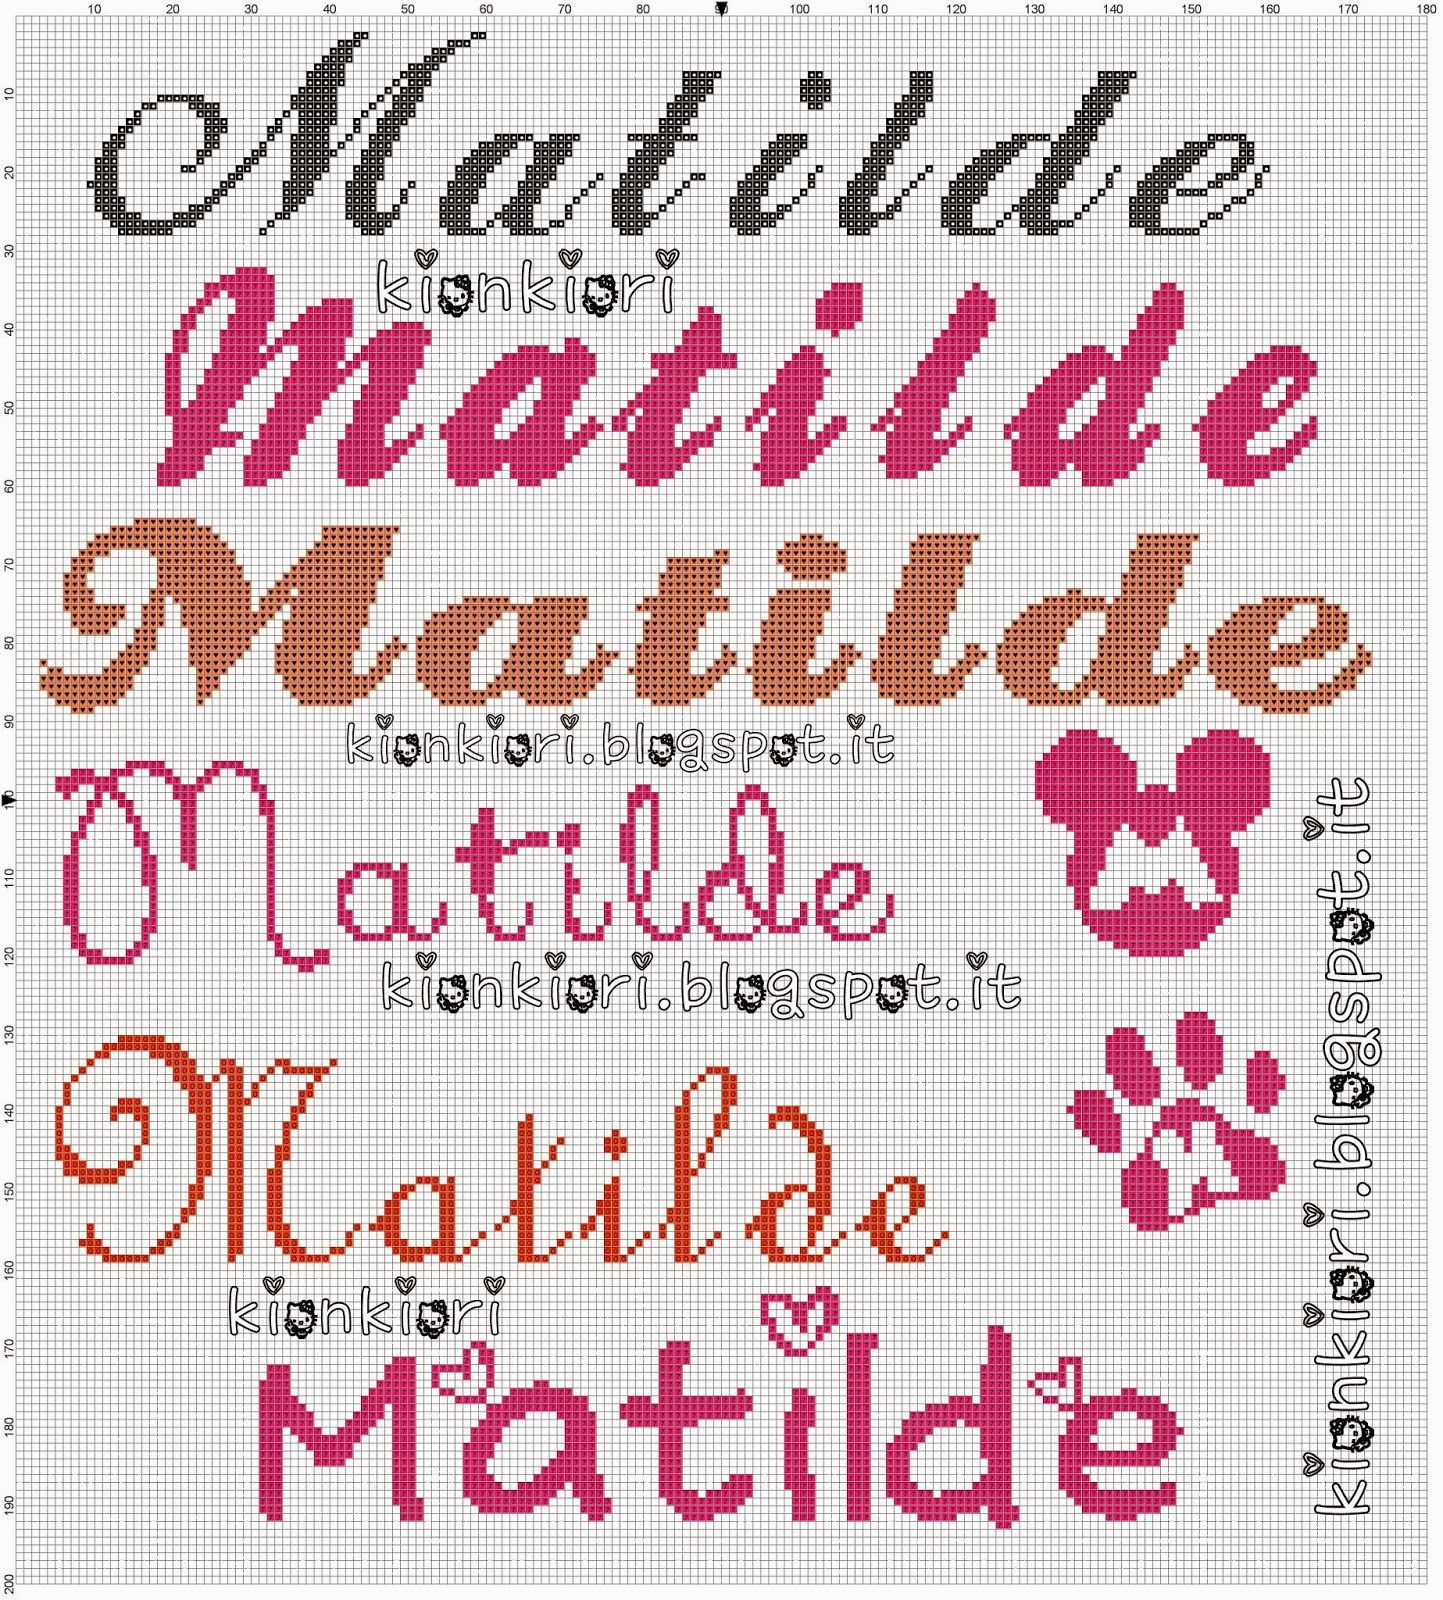 matilde+corsivo+30.jpg (1443×1600)